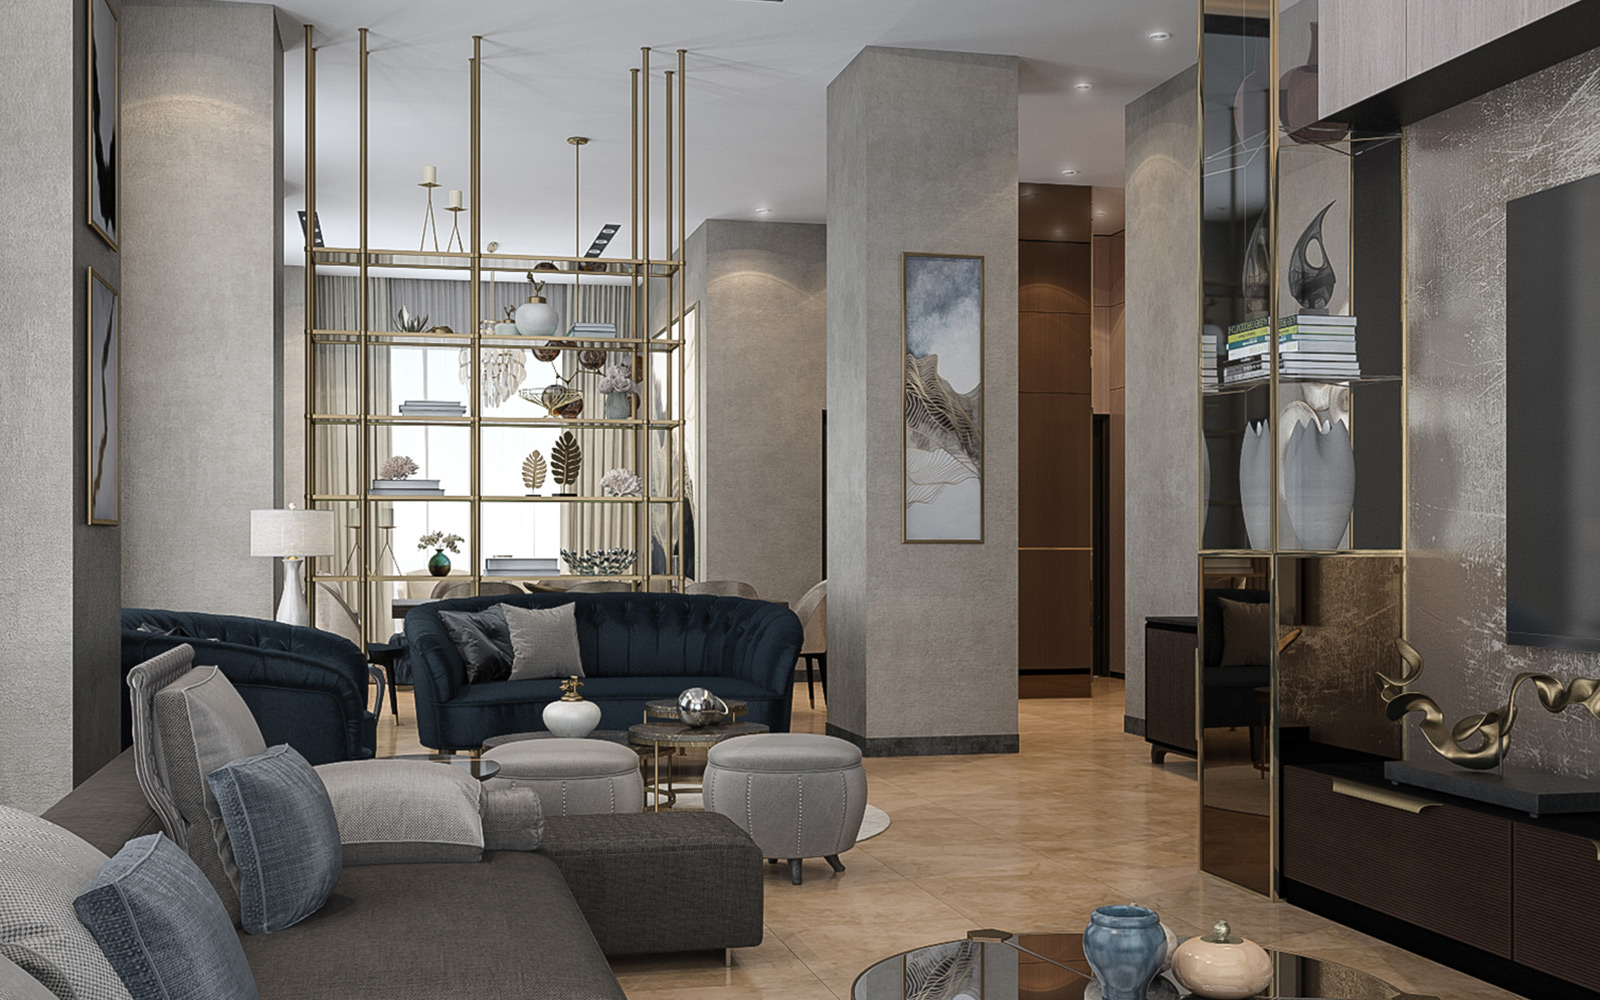 Vogue Design - Istanbul Basaksehir Flat4